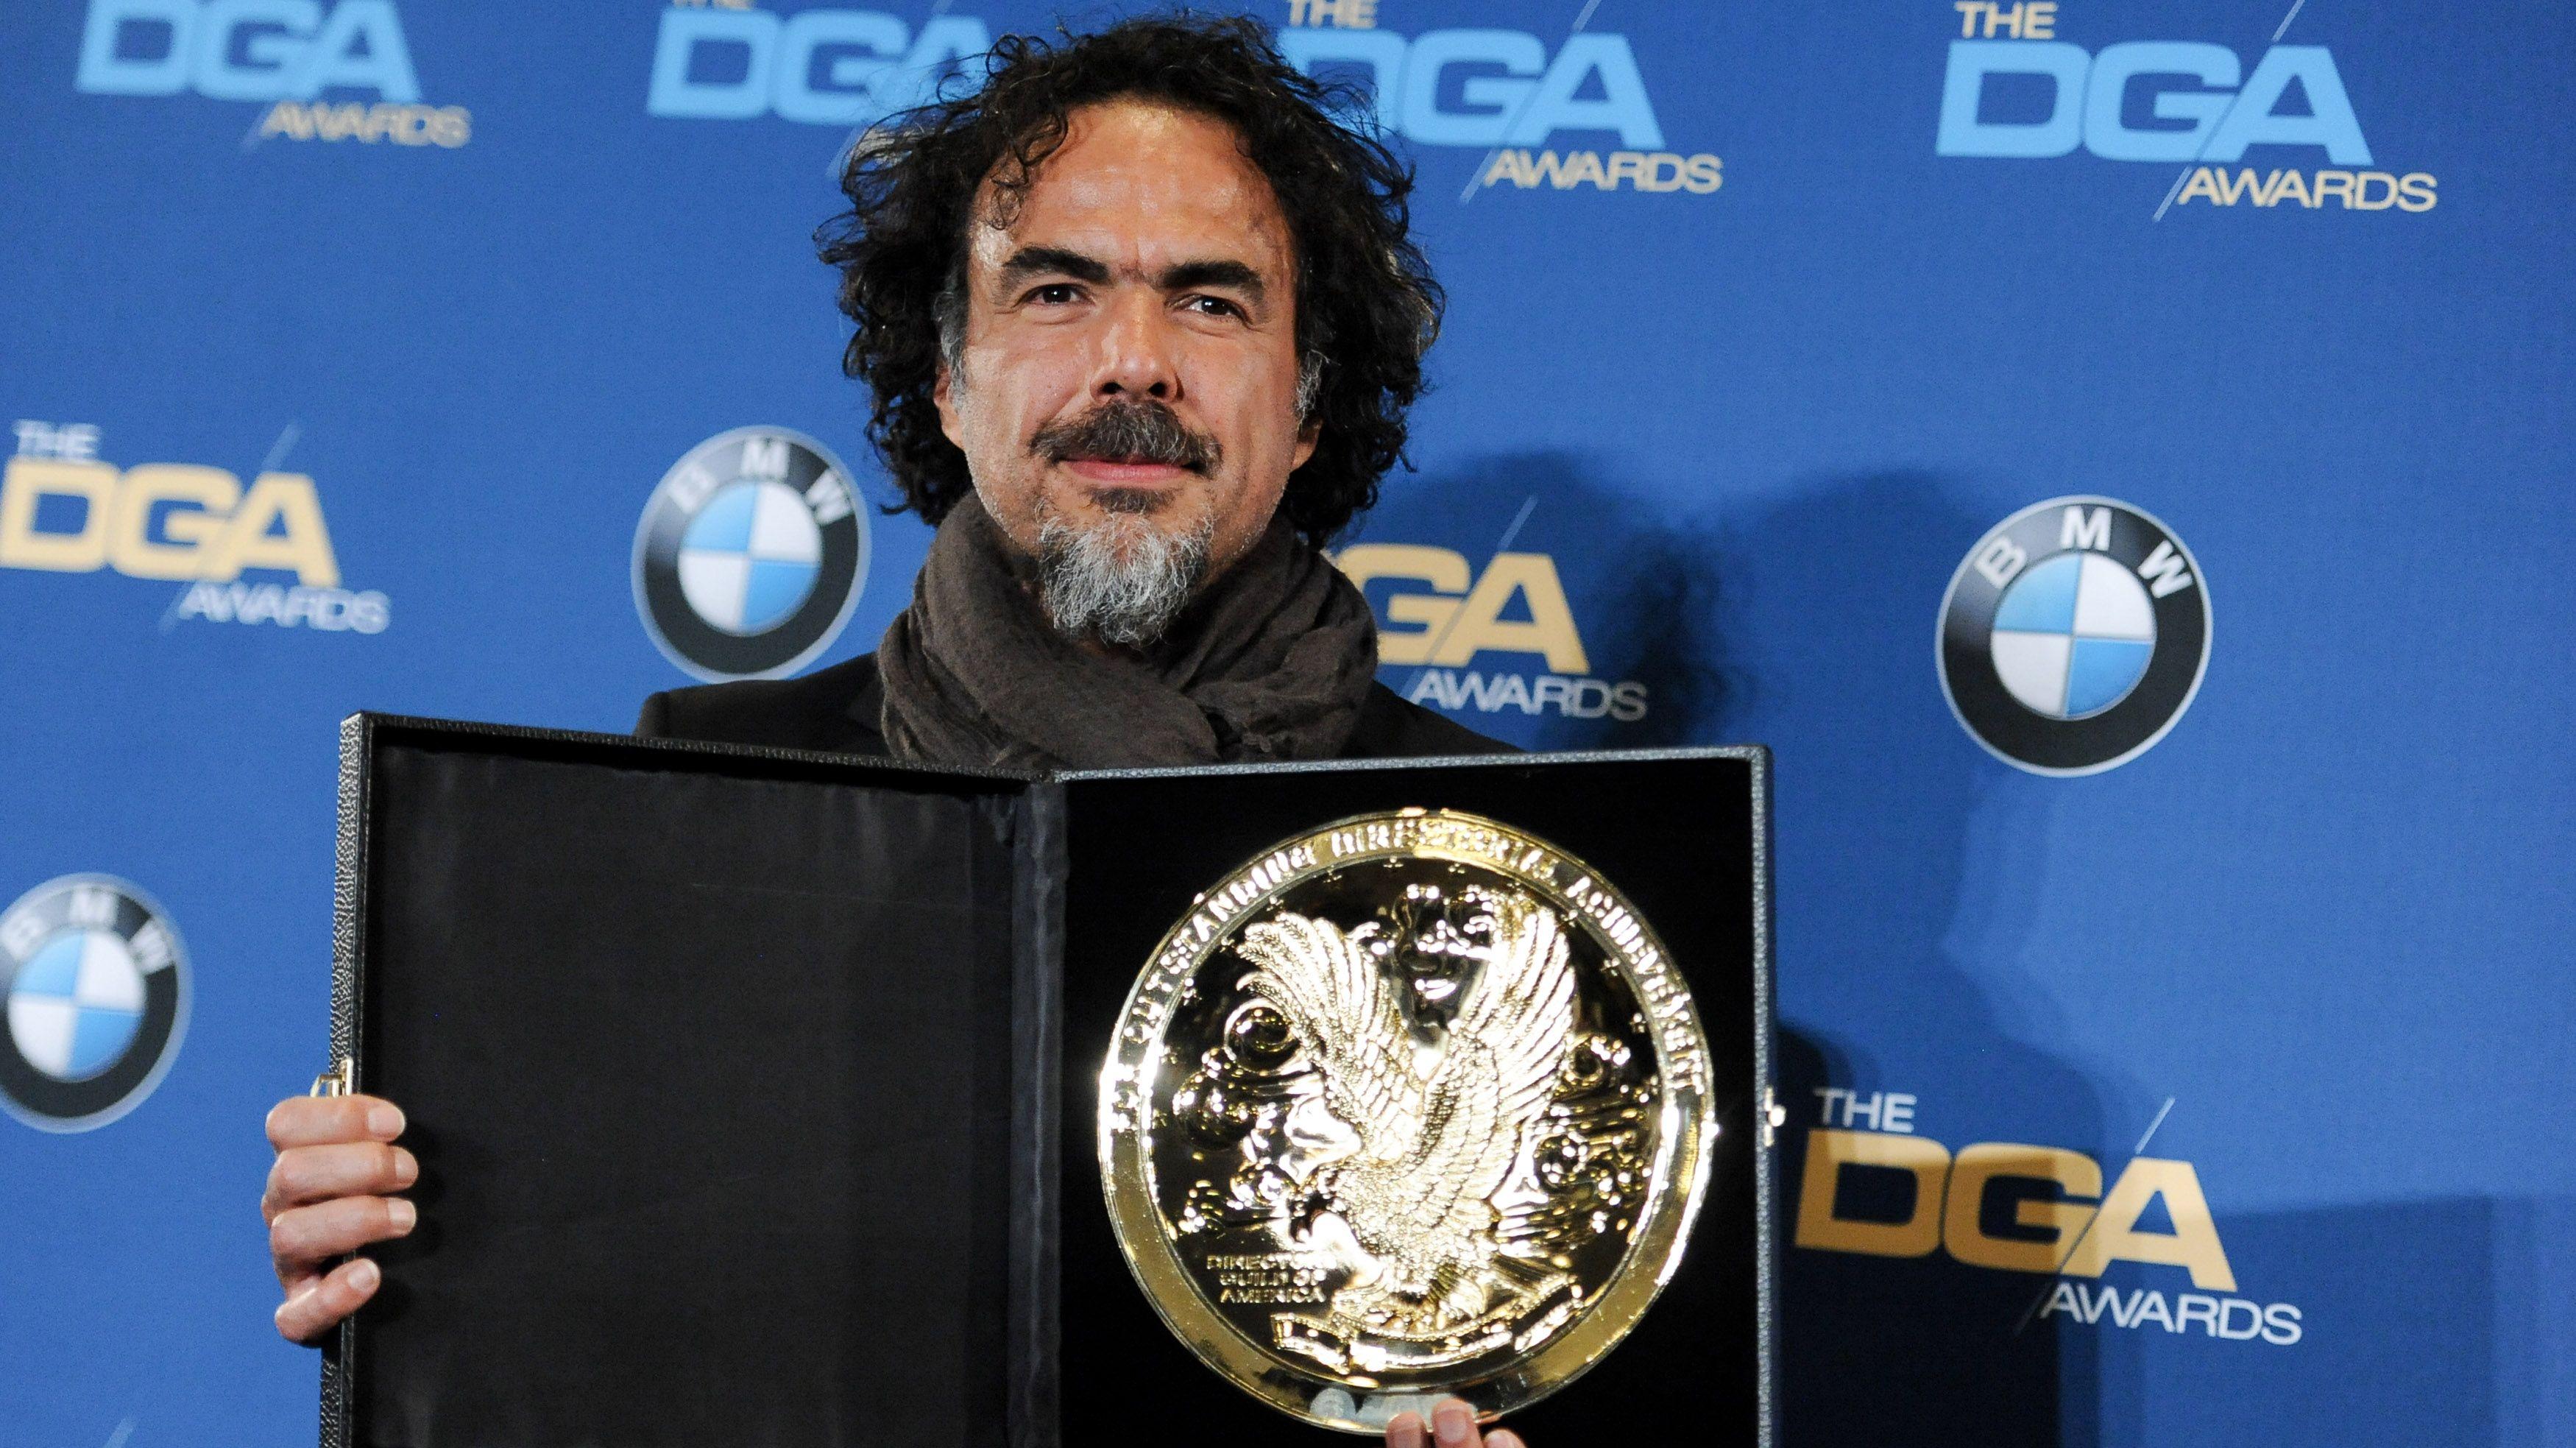 Alejandro González Iñárritu posa com o prêmio por Birdman (photo by pipocamoderna.com.br)